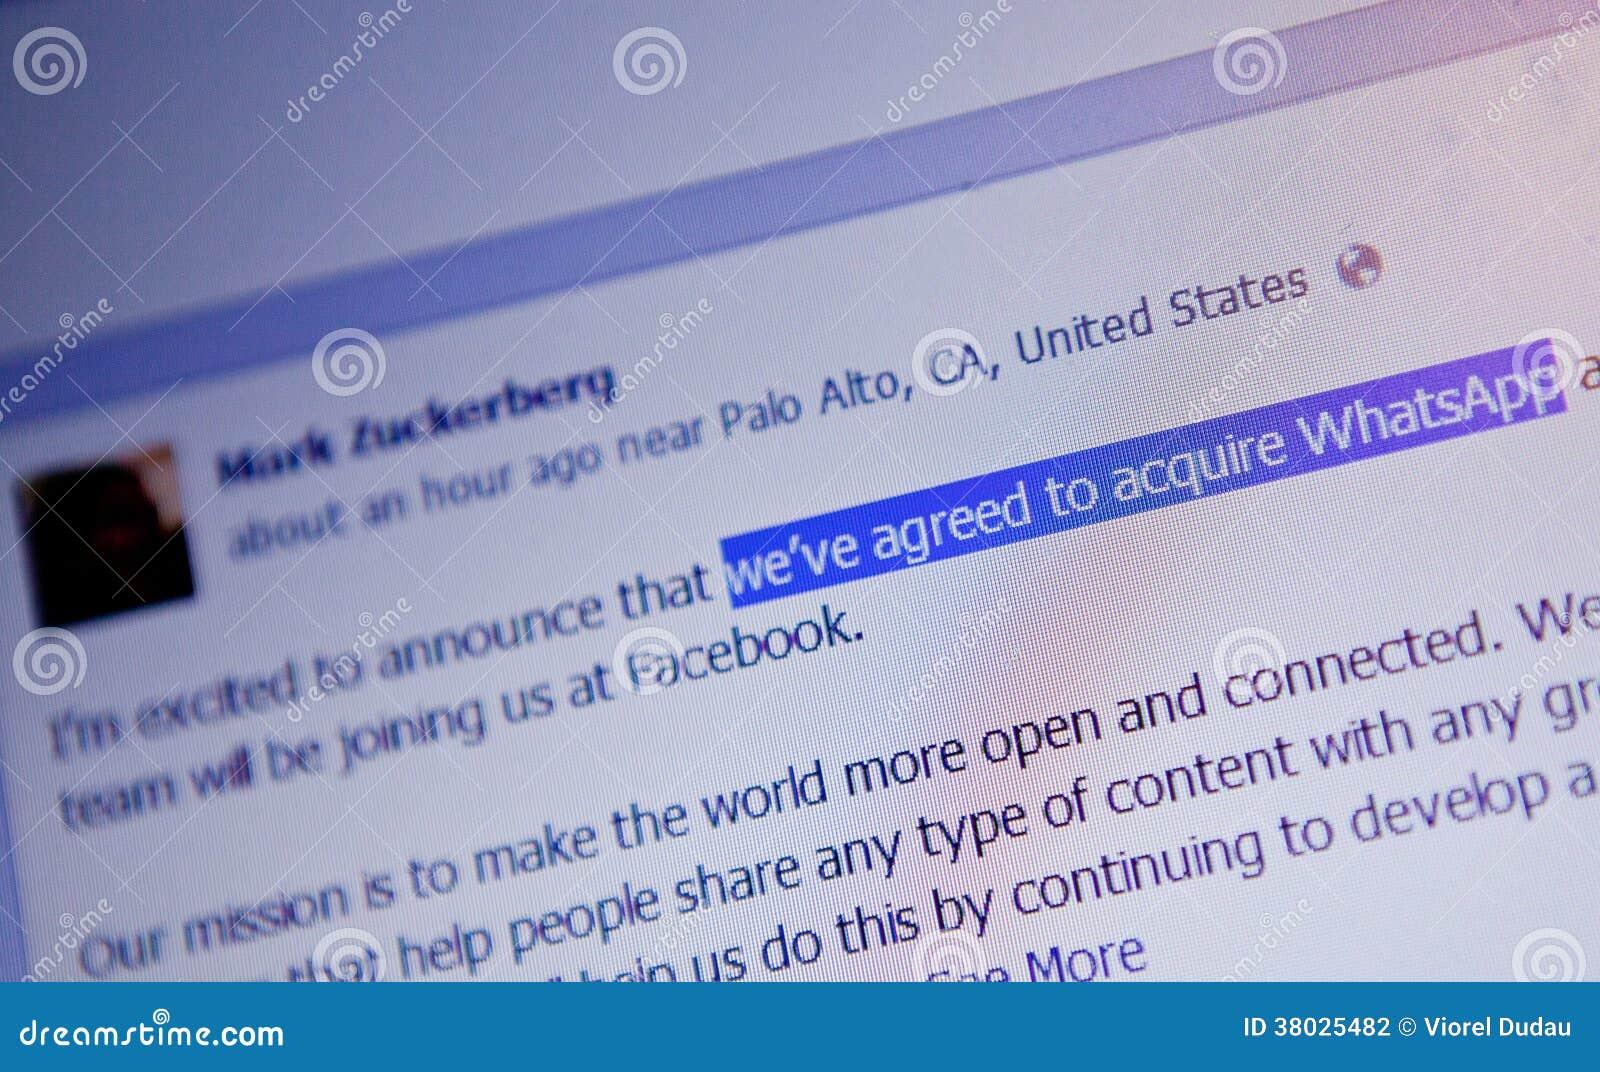 Mark Zuckerberg WhatsApp acquisition announcement